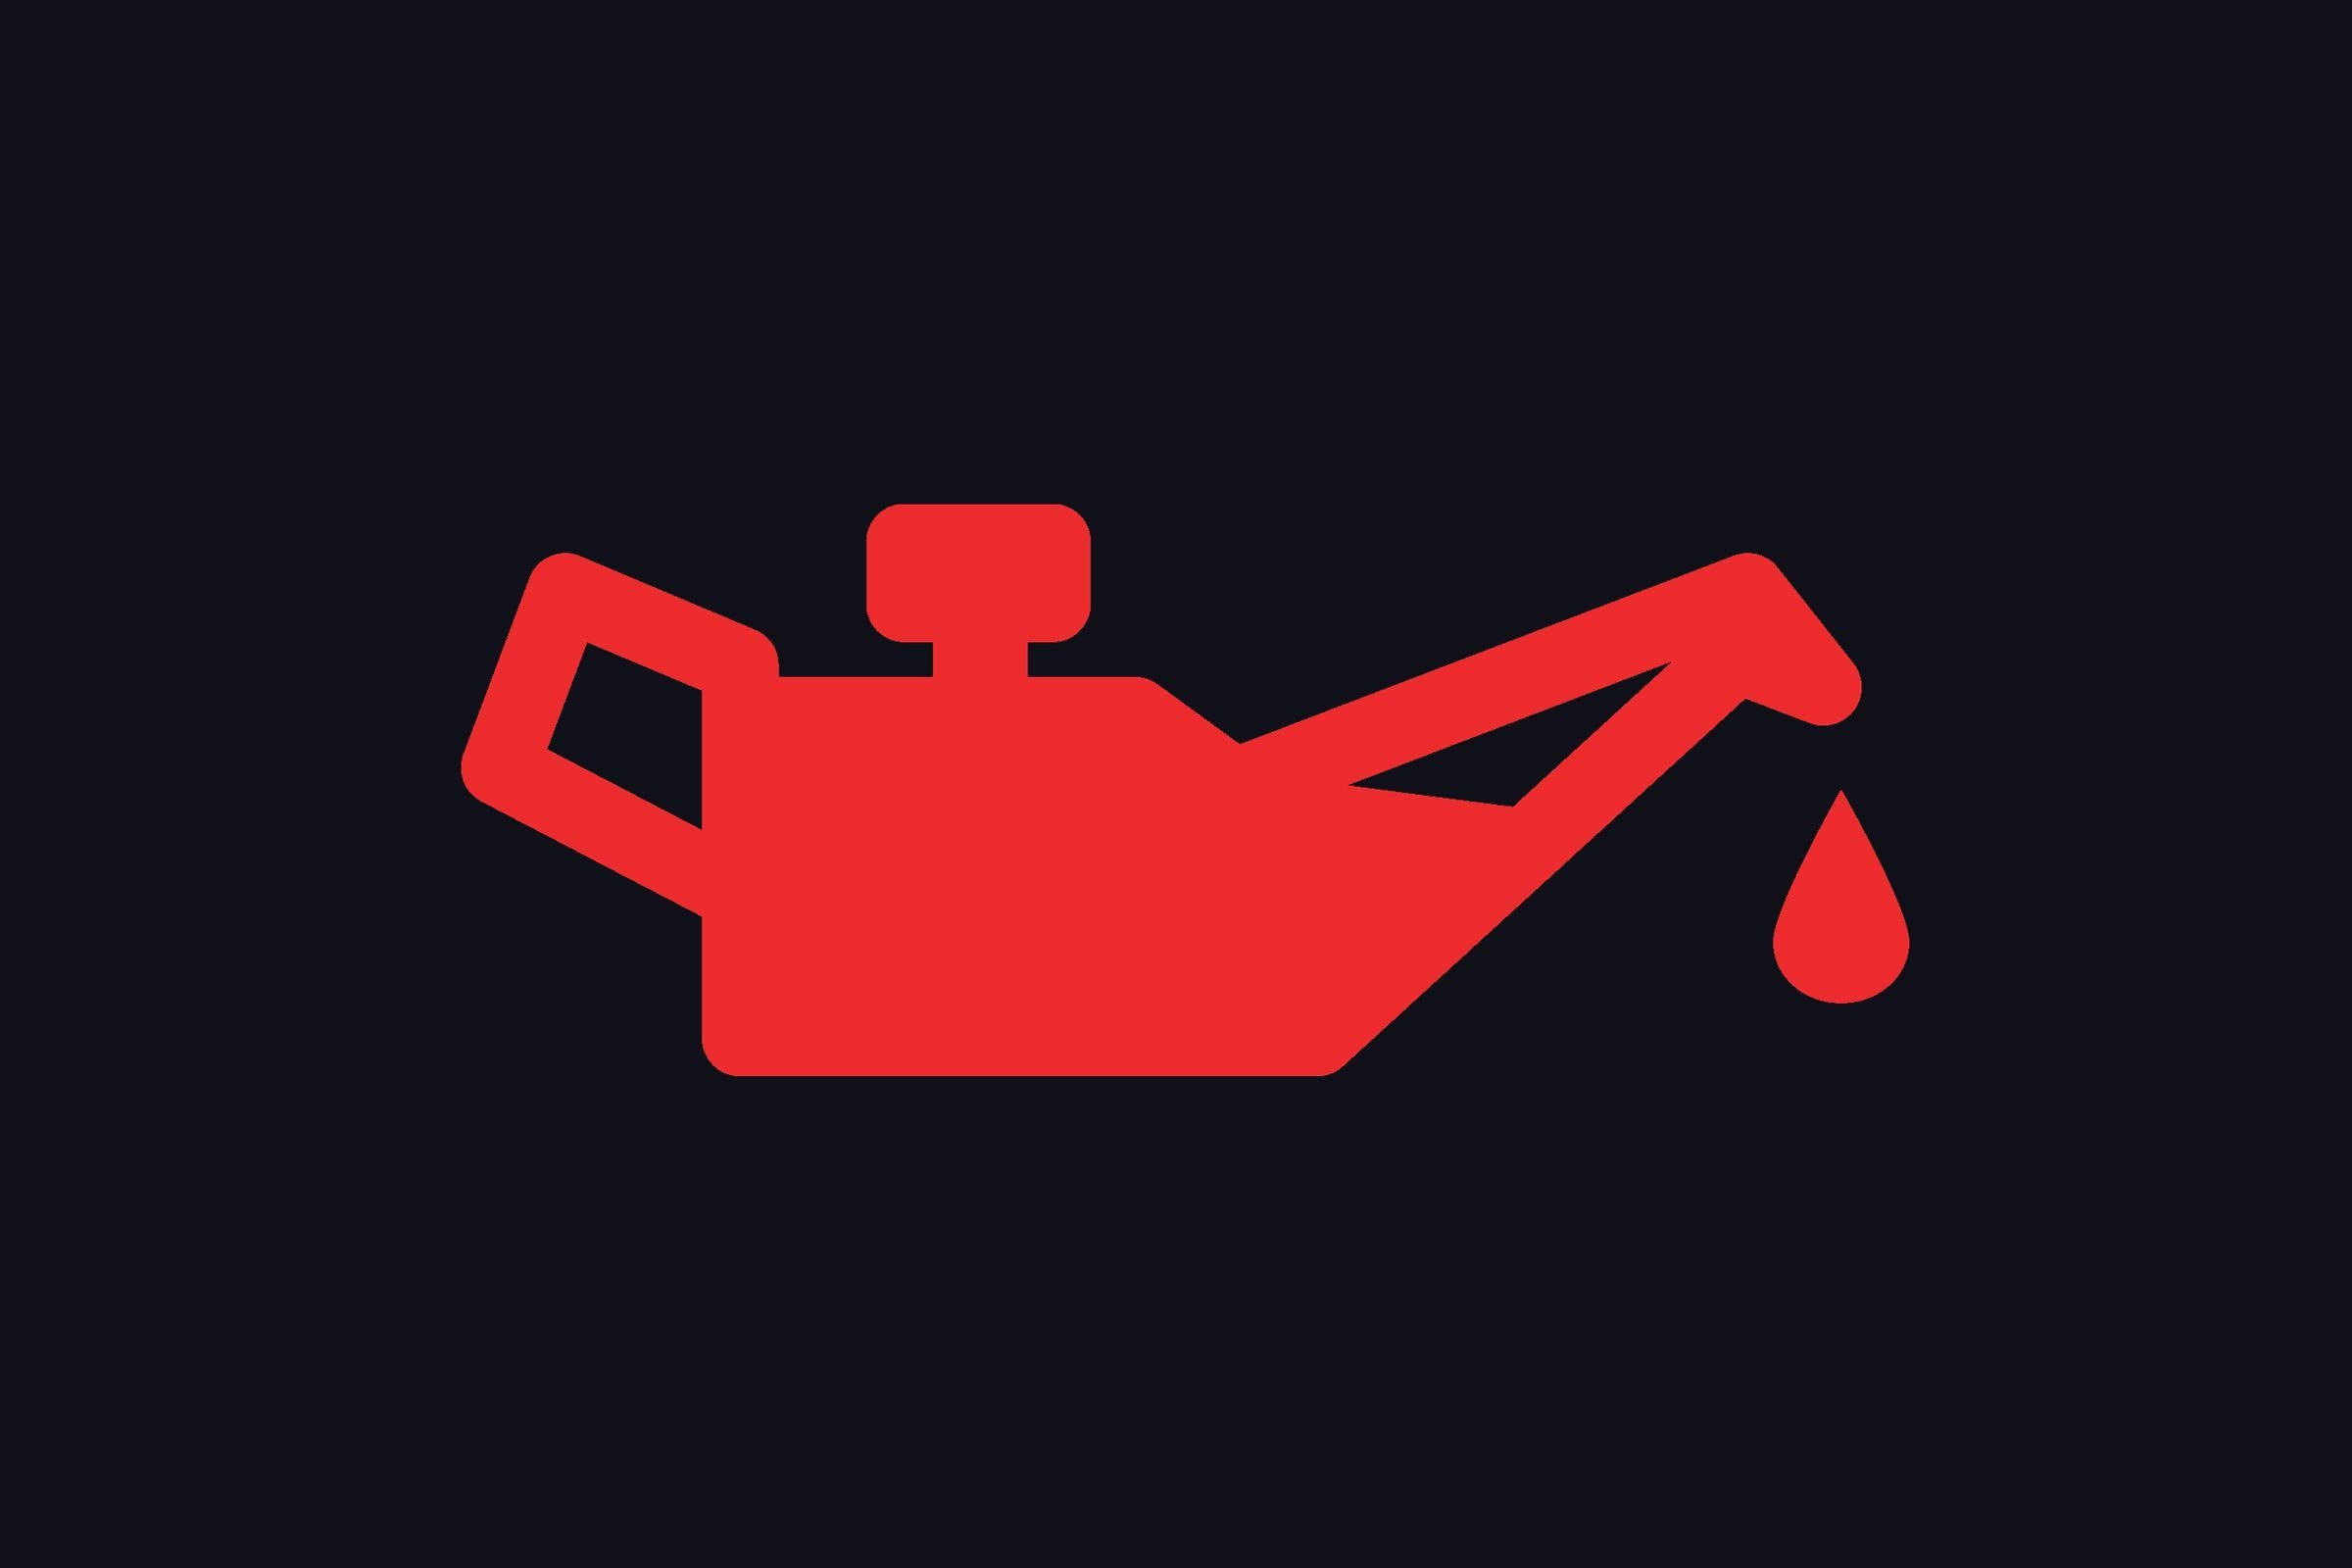 oil pressure symbol